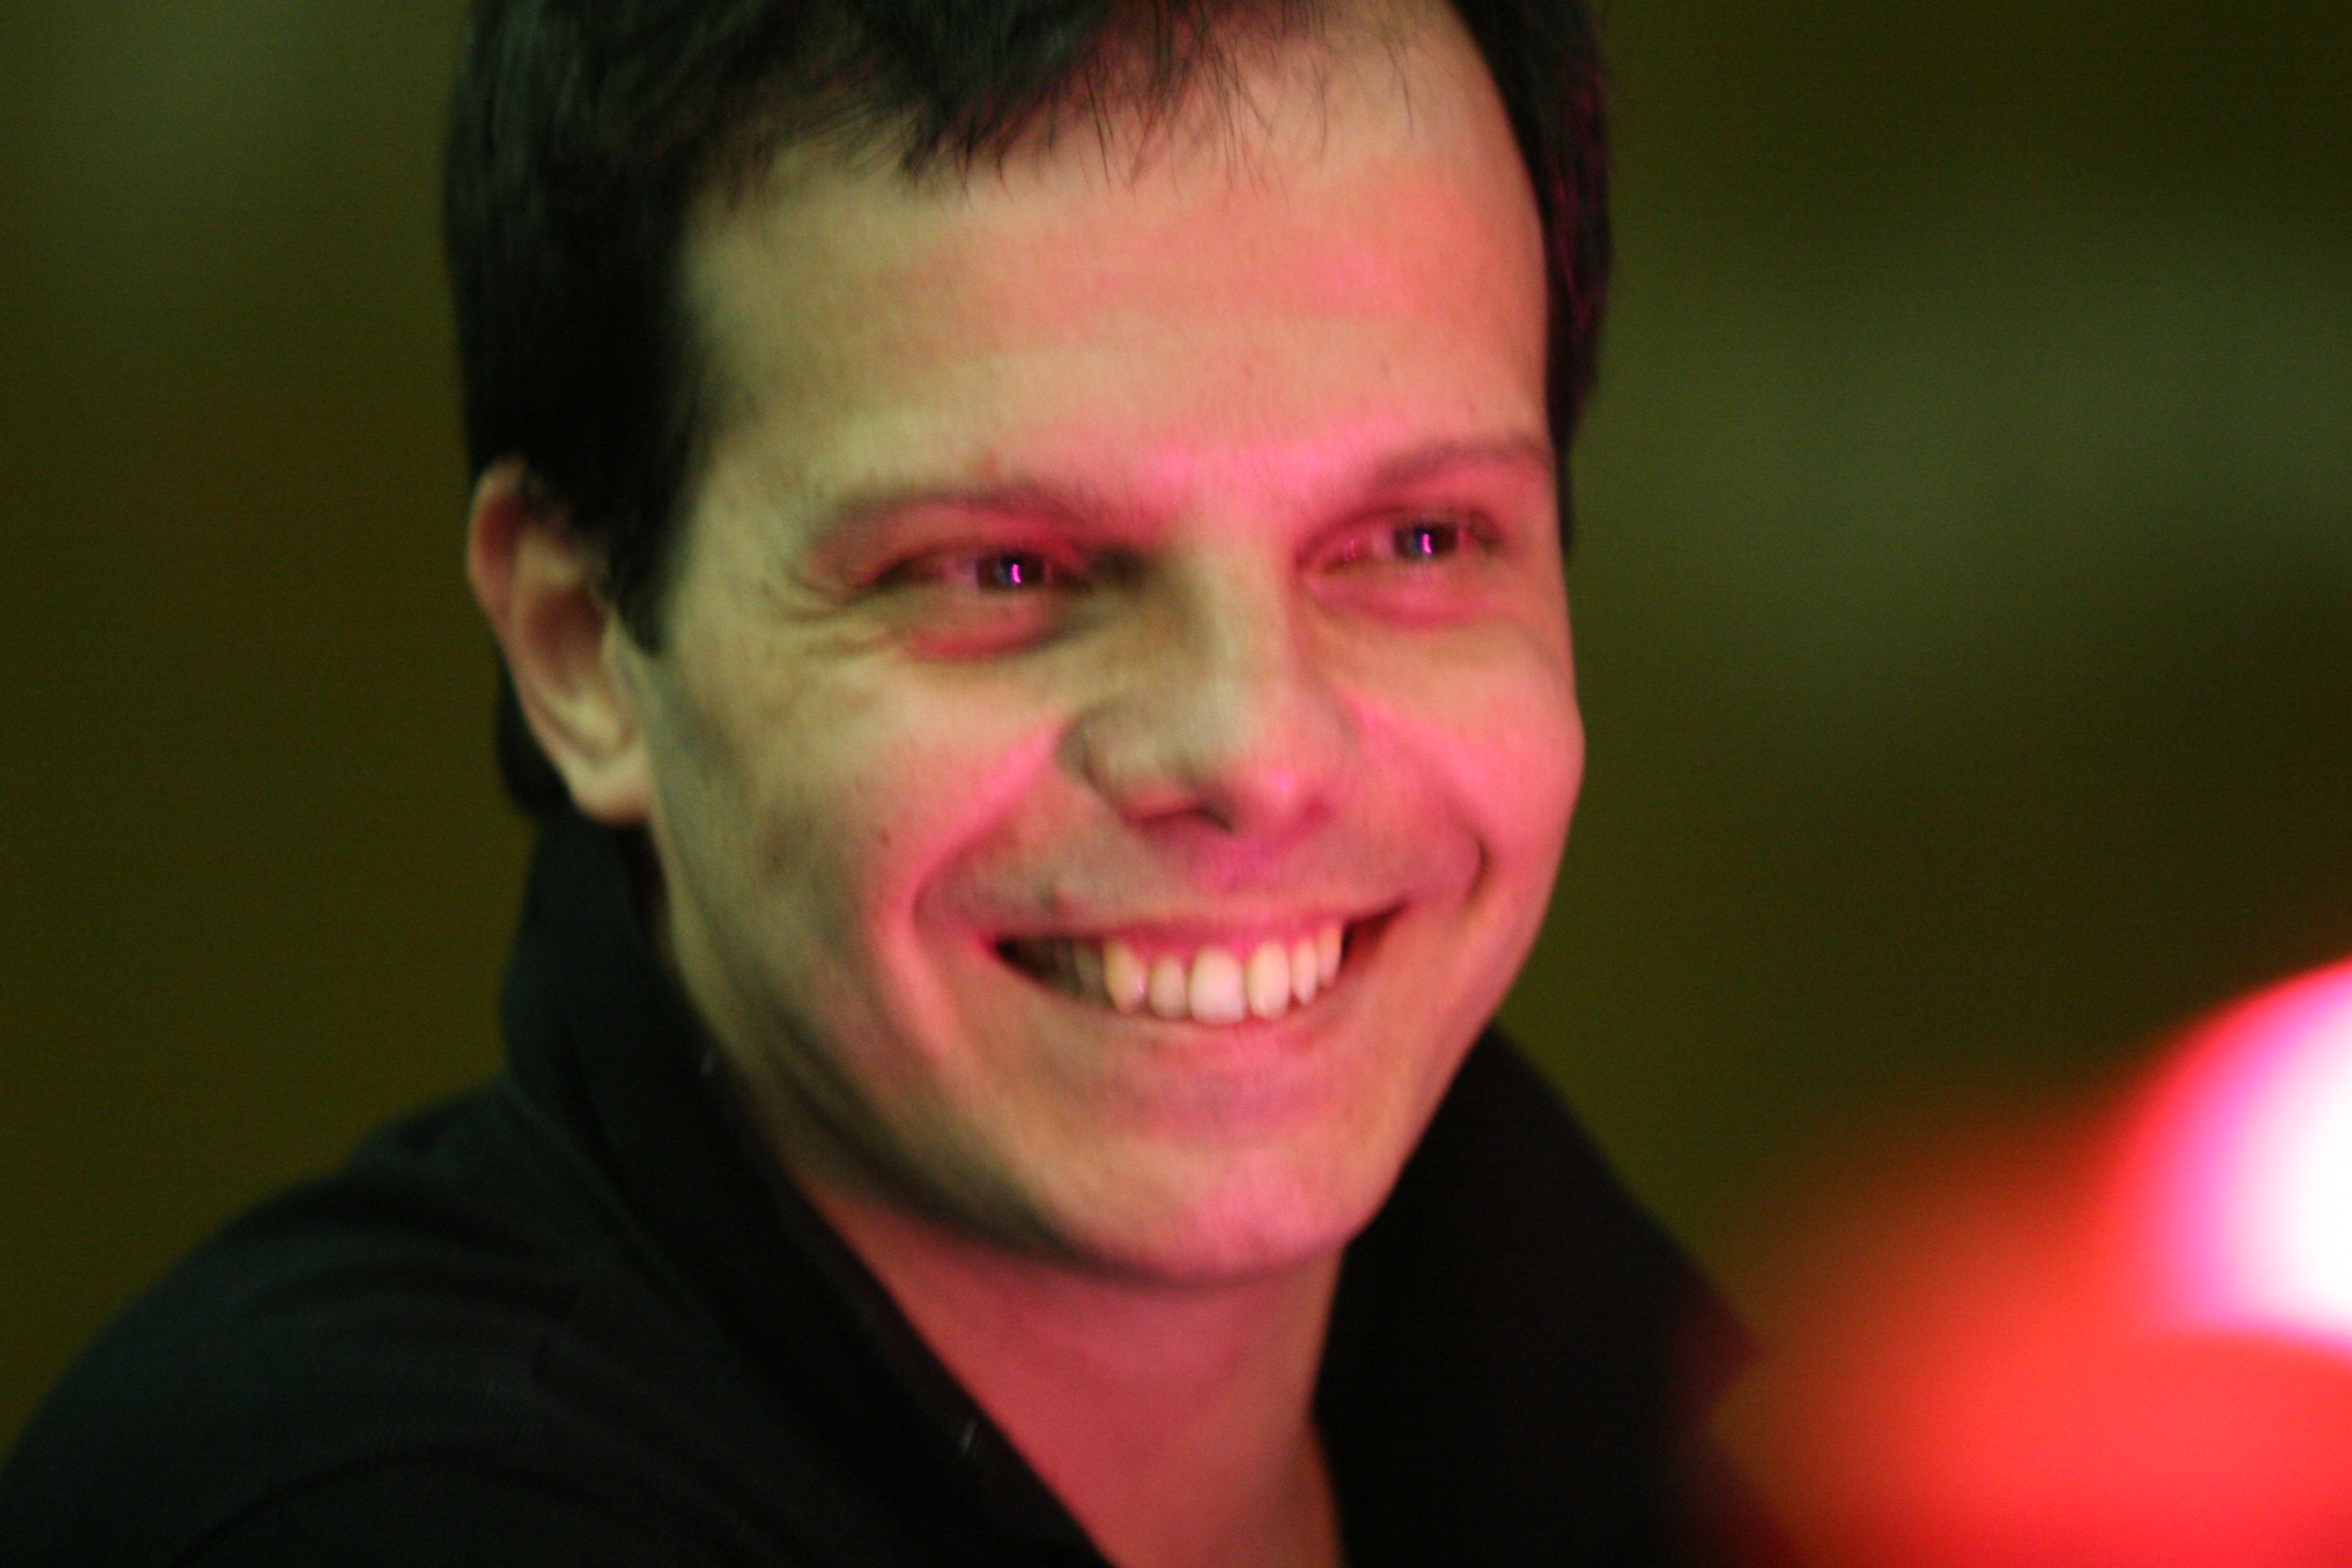 Caio Nunes